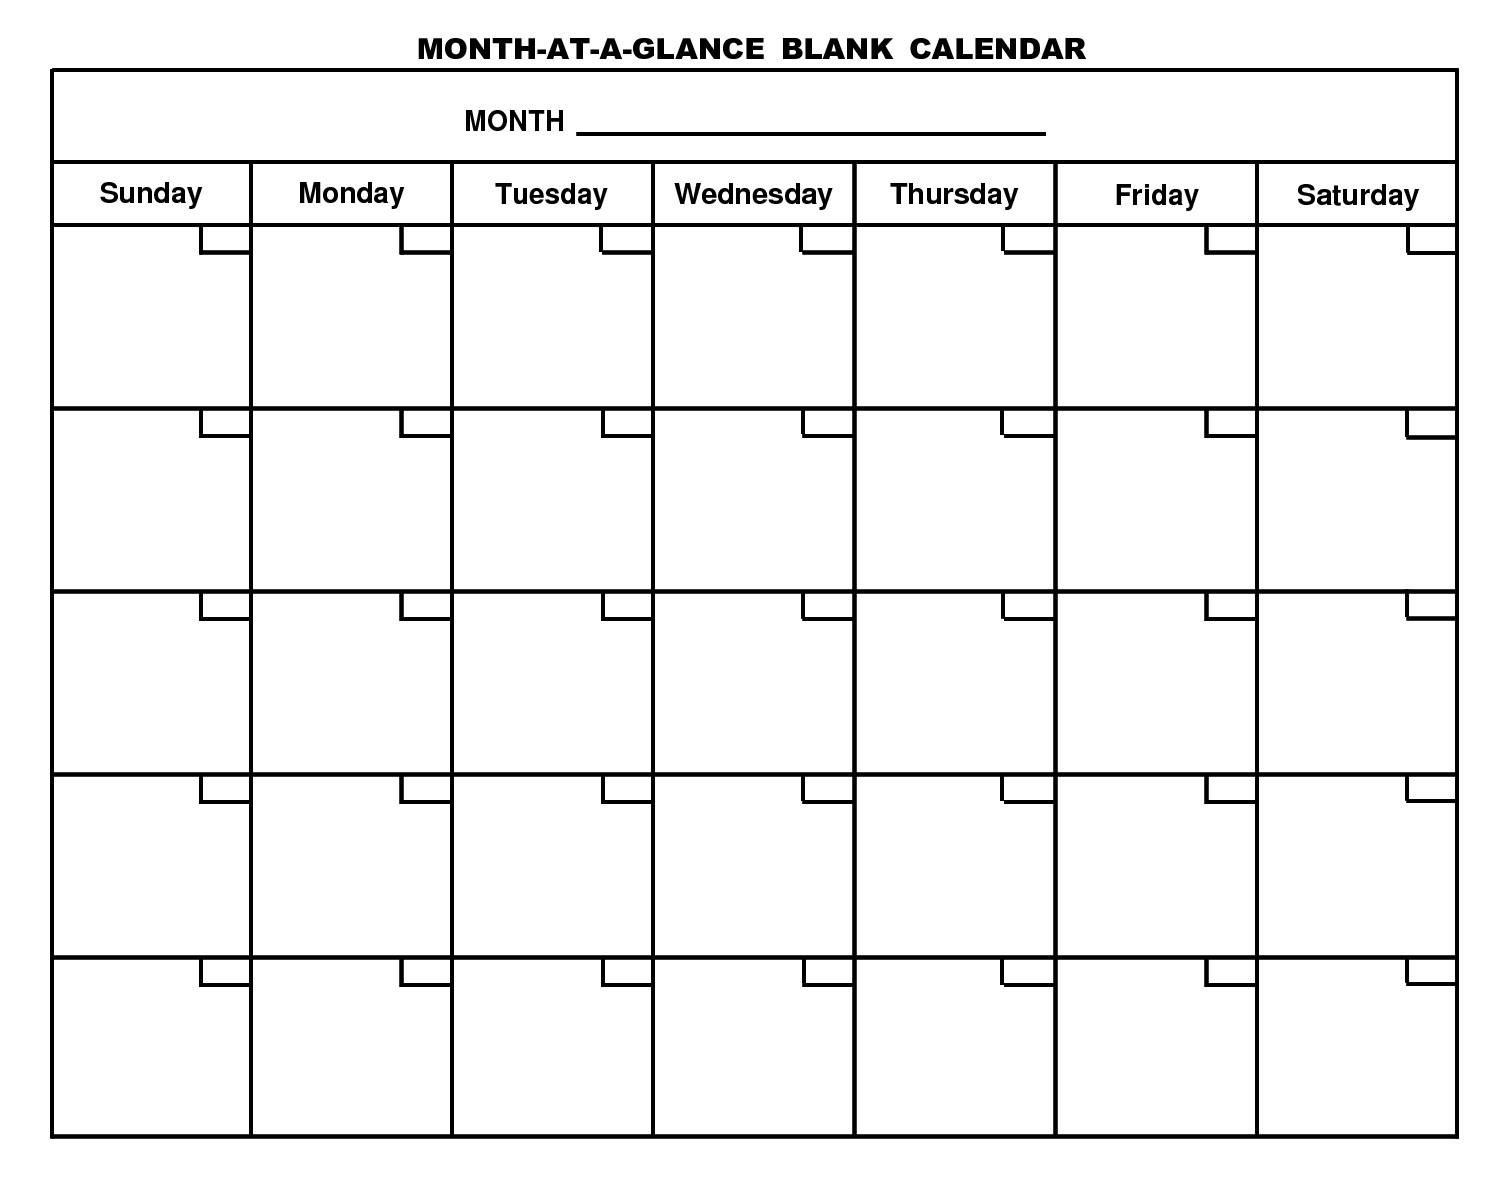 Calendar Template To Print Calendar Month Printable Inside Calendar in Editable Printable Calendars By Month